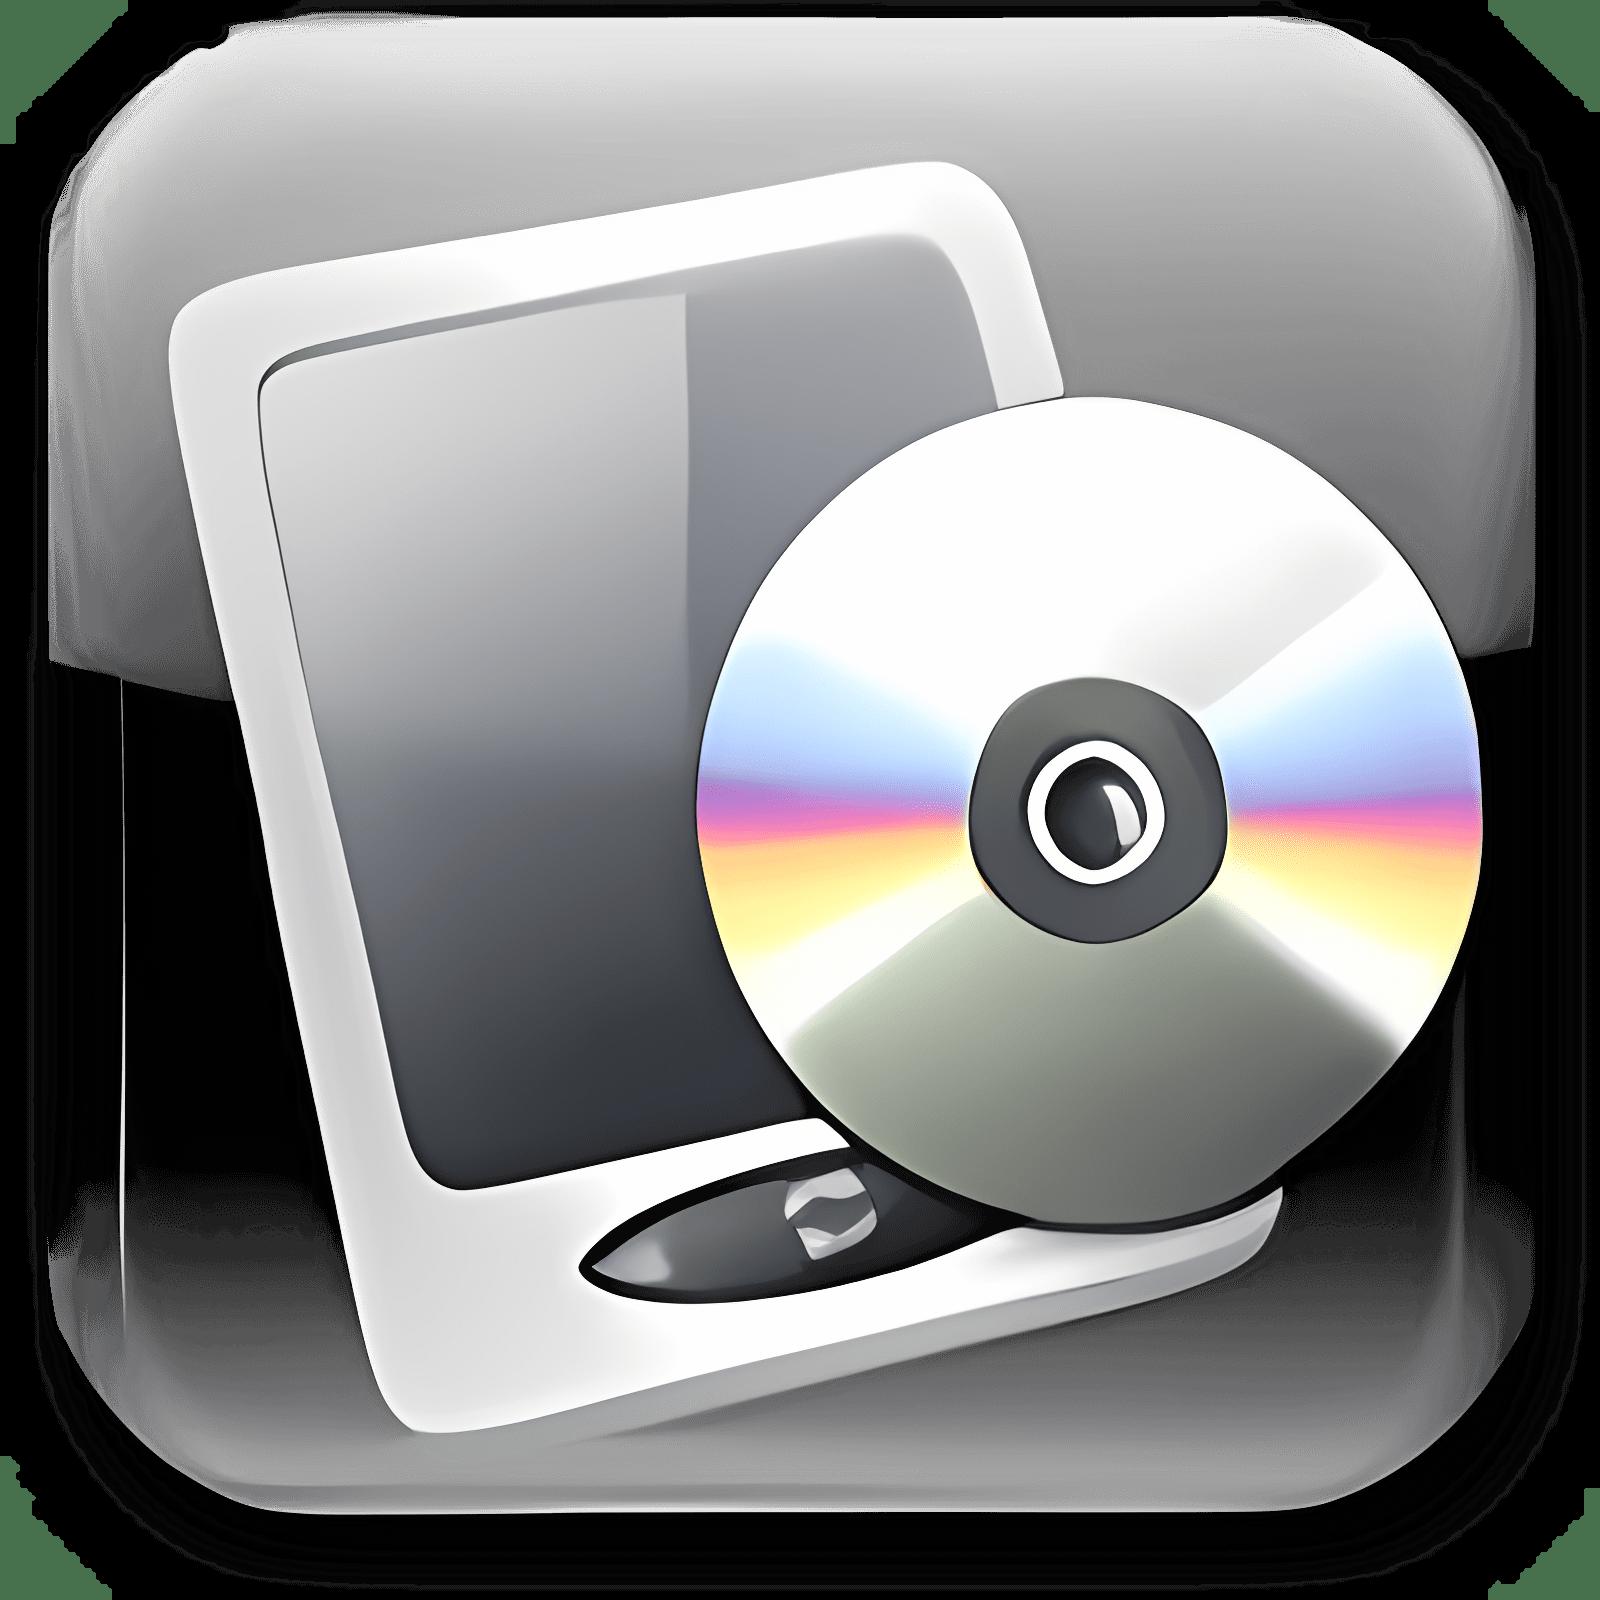 ArcSoft MediaConverter